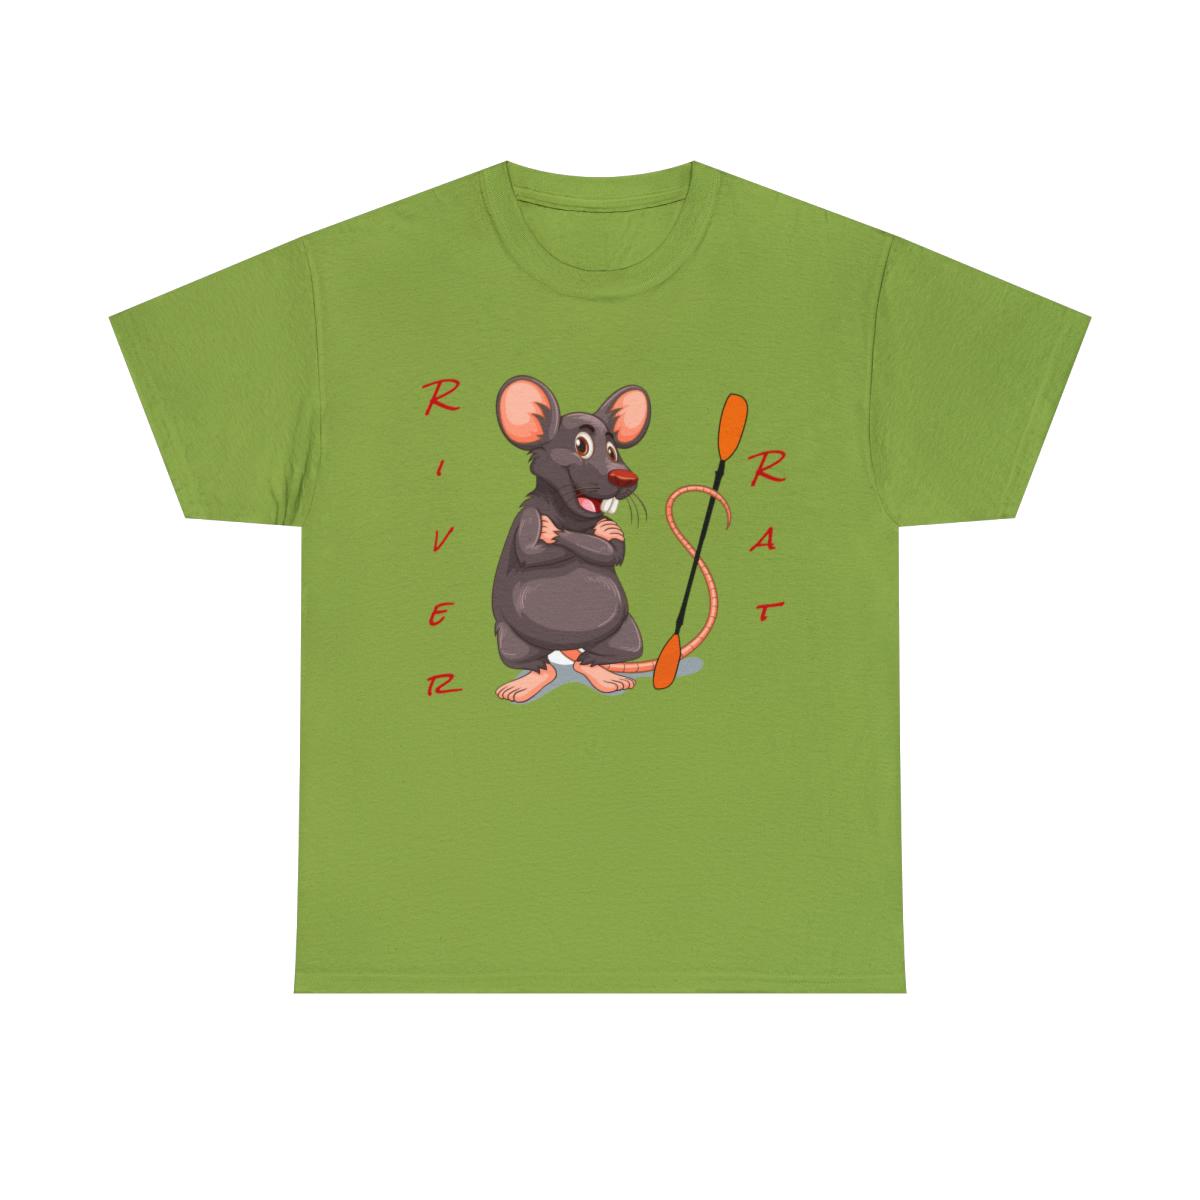 Happy-River-Rats-Kayak-T-Shirt-Unisex-Heavy-Cotton-Tee thumbnail 9